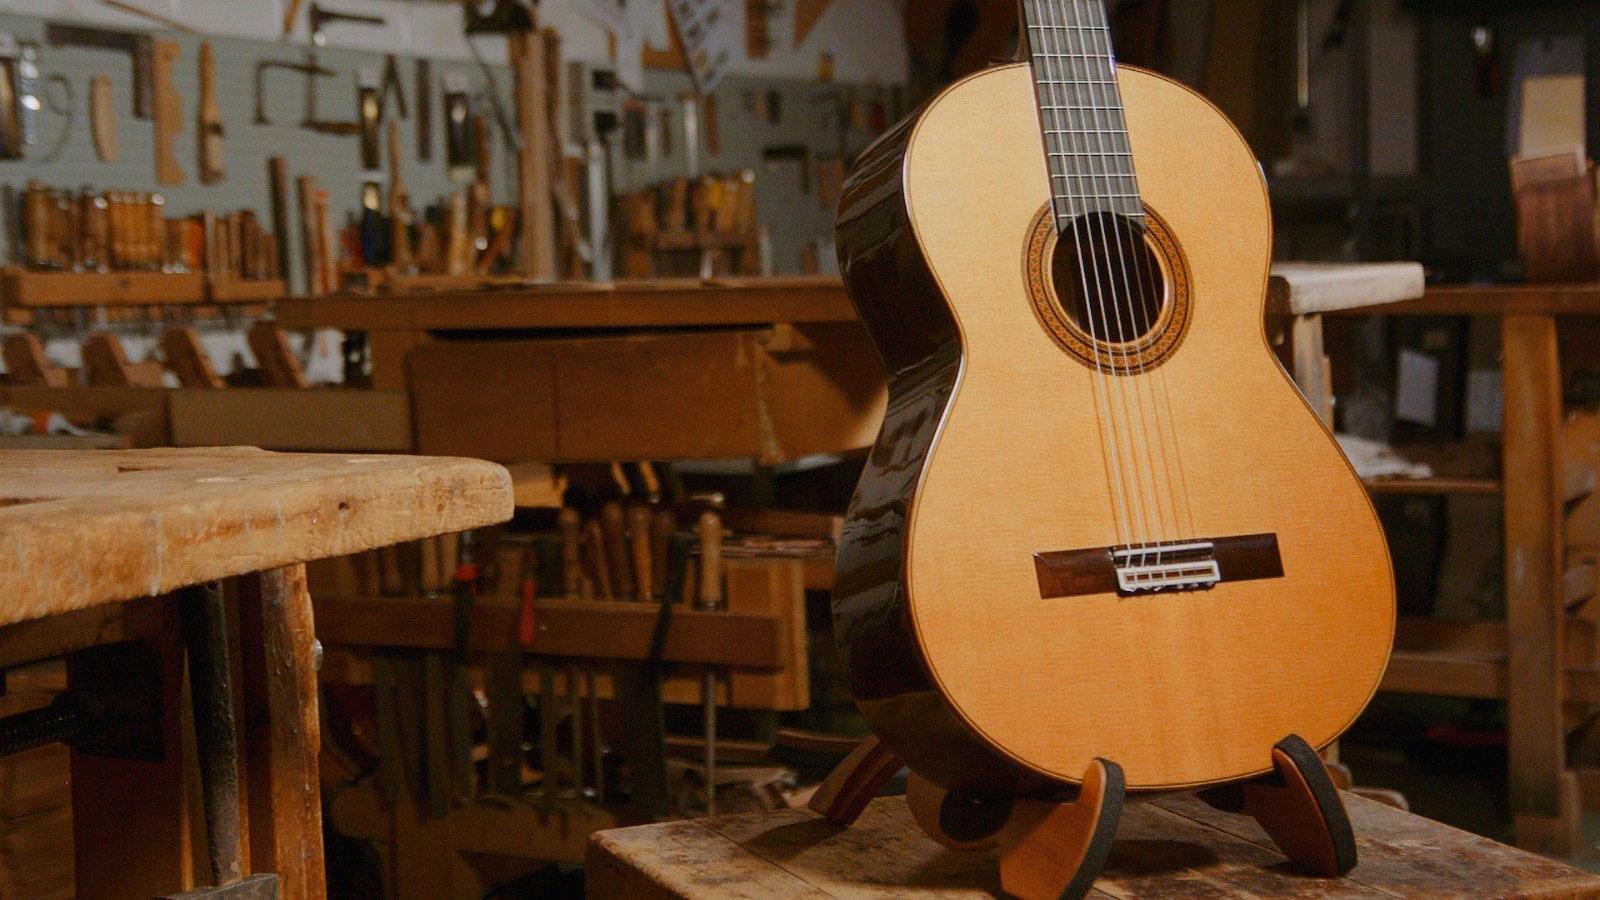 Taller Guitarras Ramirez